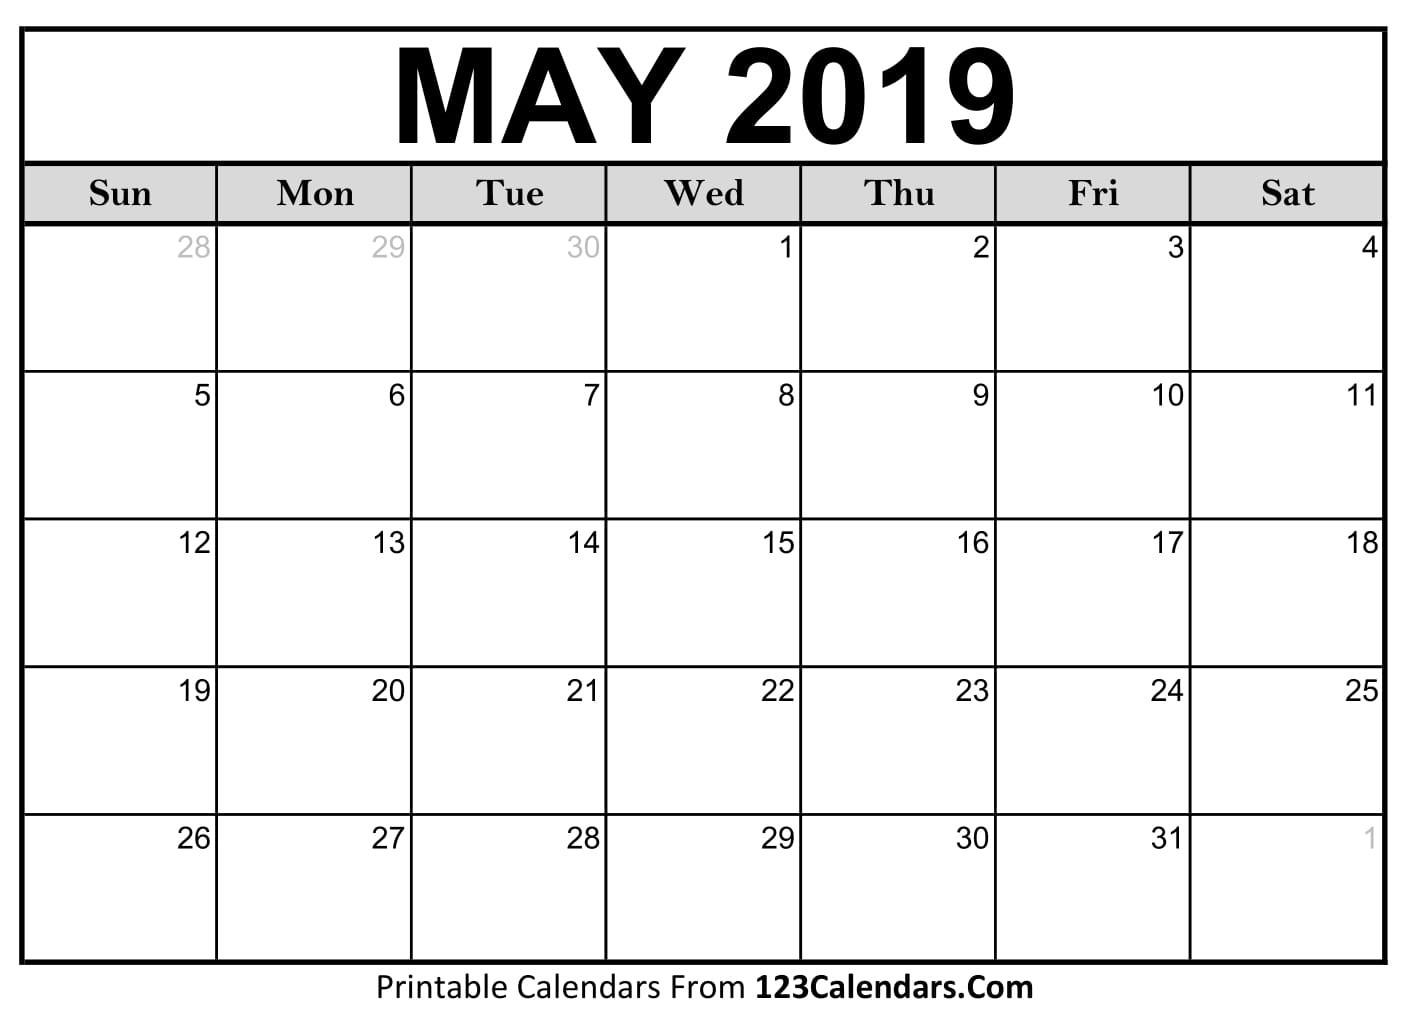 Printable May 2019 Calendar Templates 123Calendars